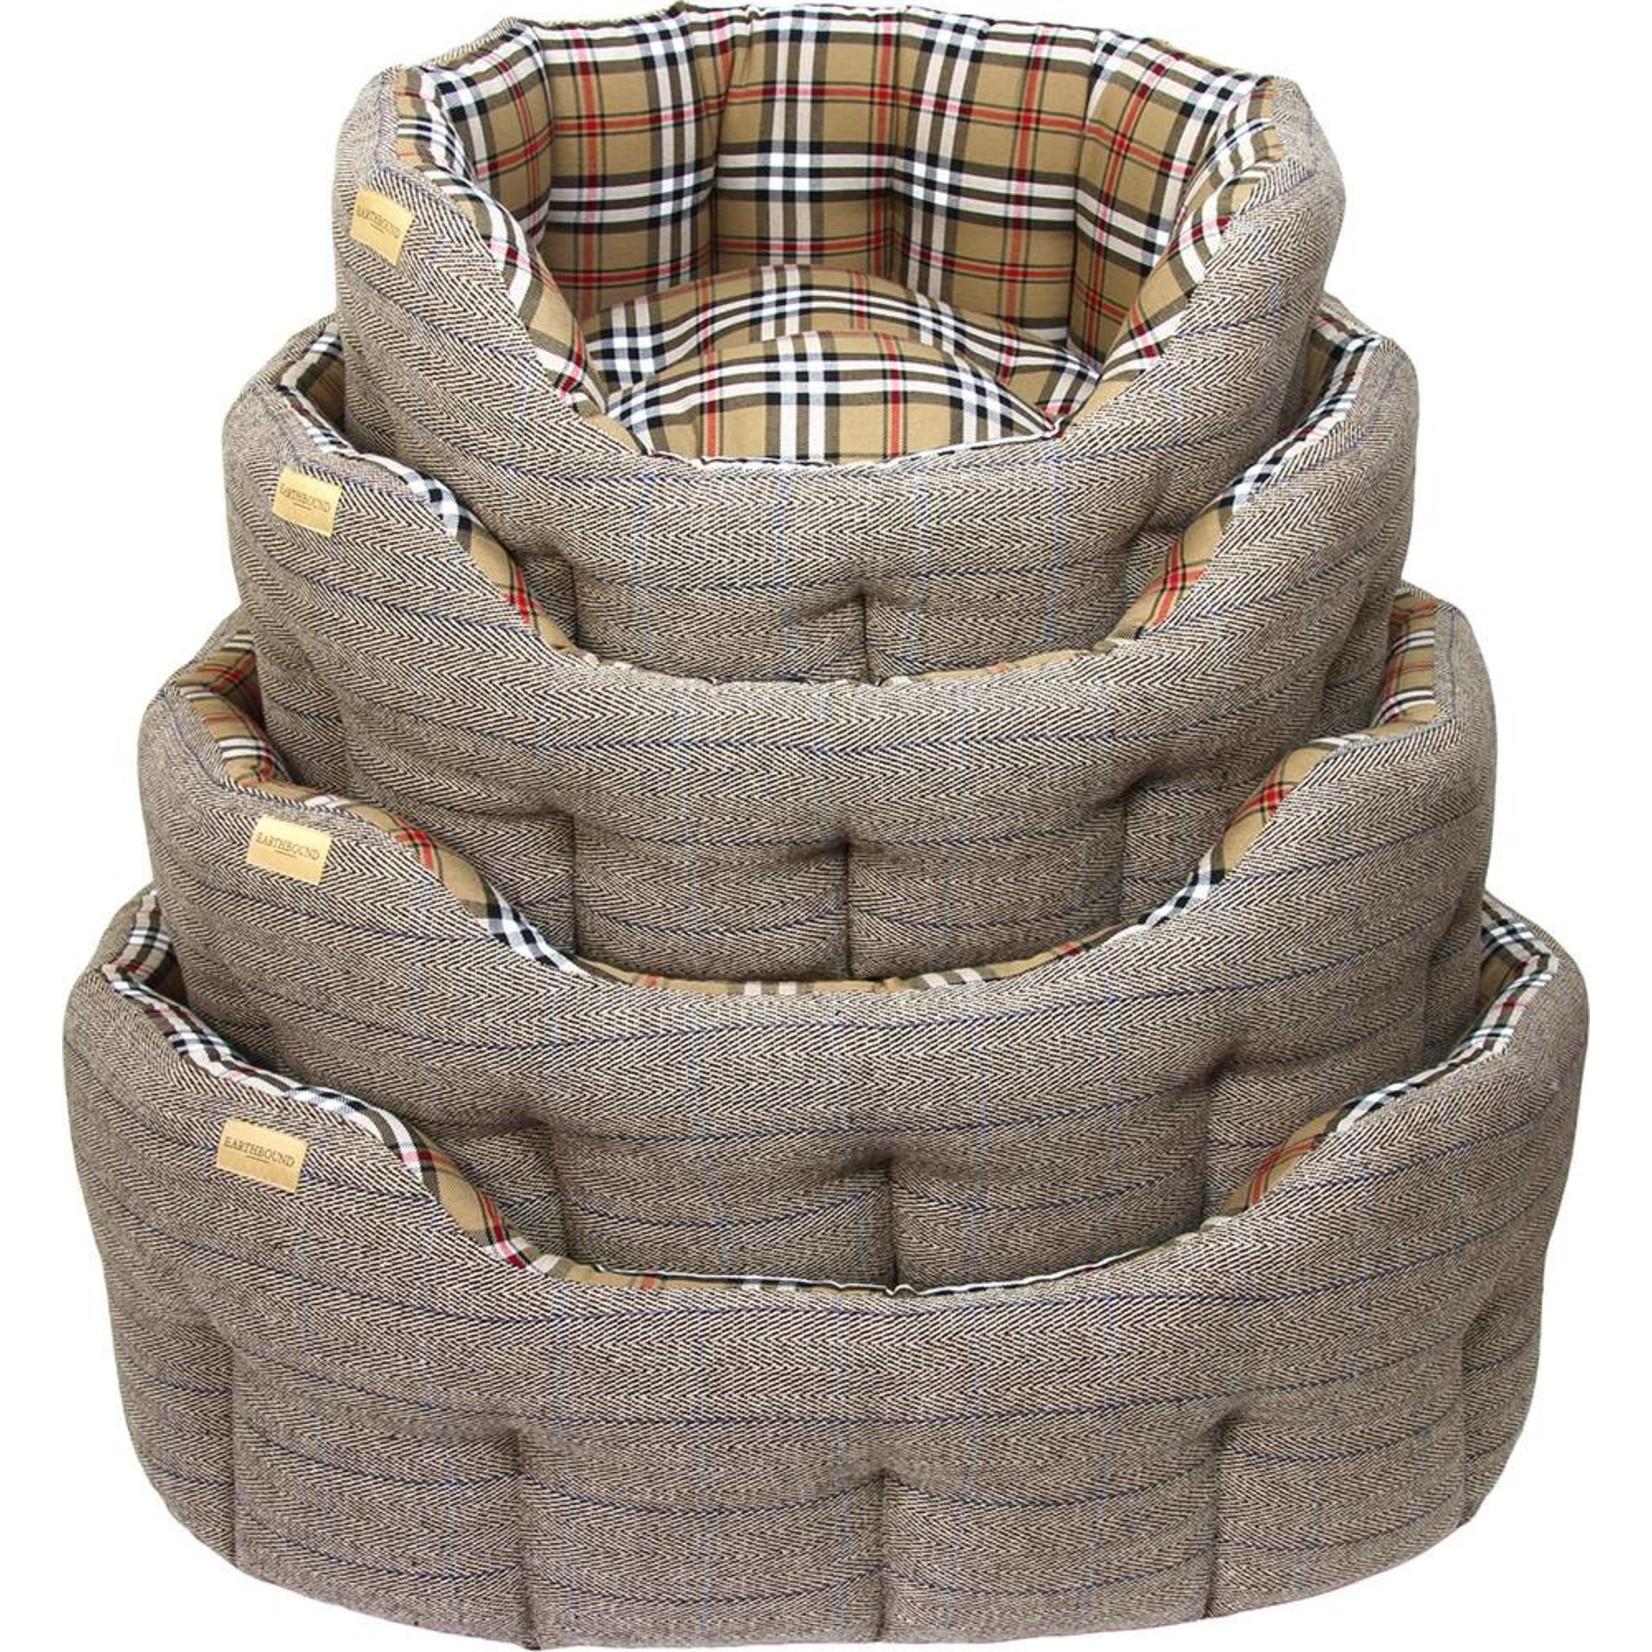 Earthbound Traditional Tweed Dog Bed, Herringbone